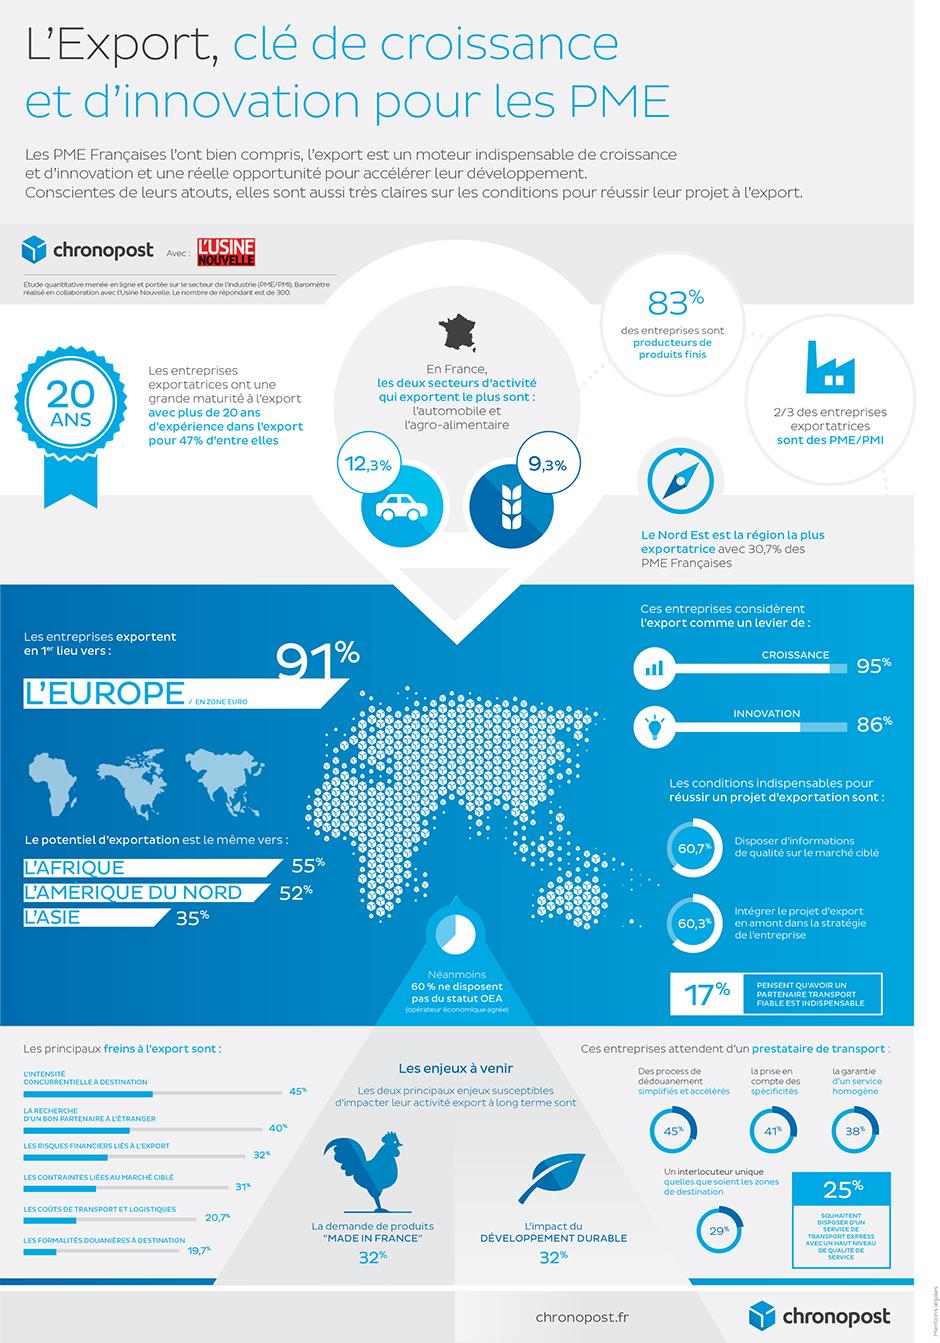 infographie-export-croissance-innovation-pme.jpg